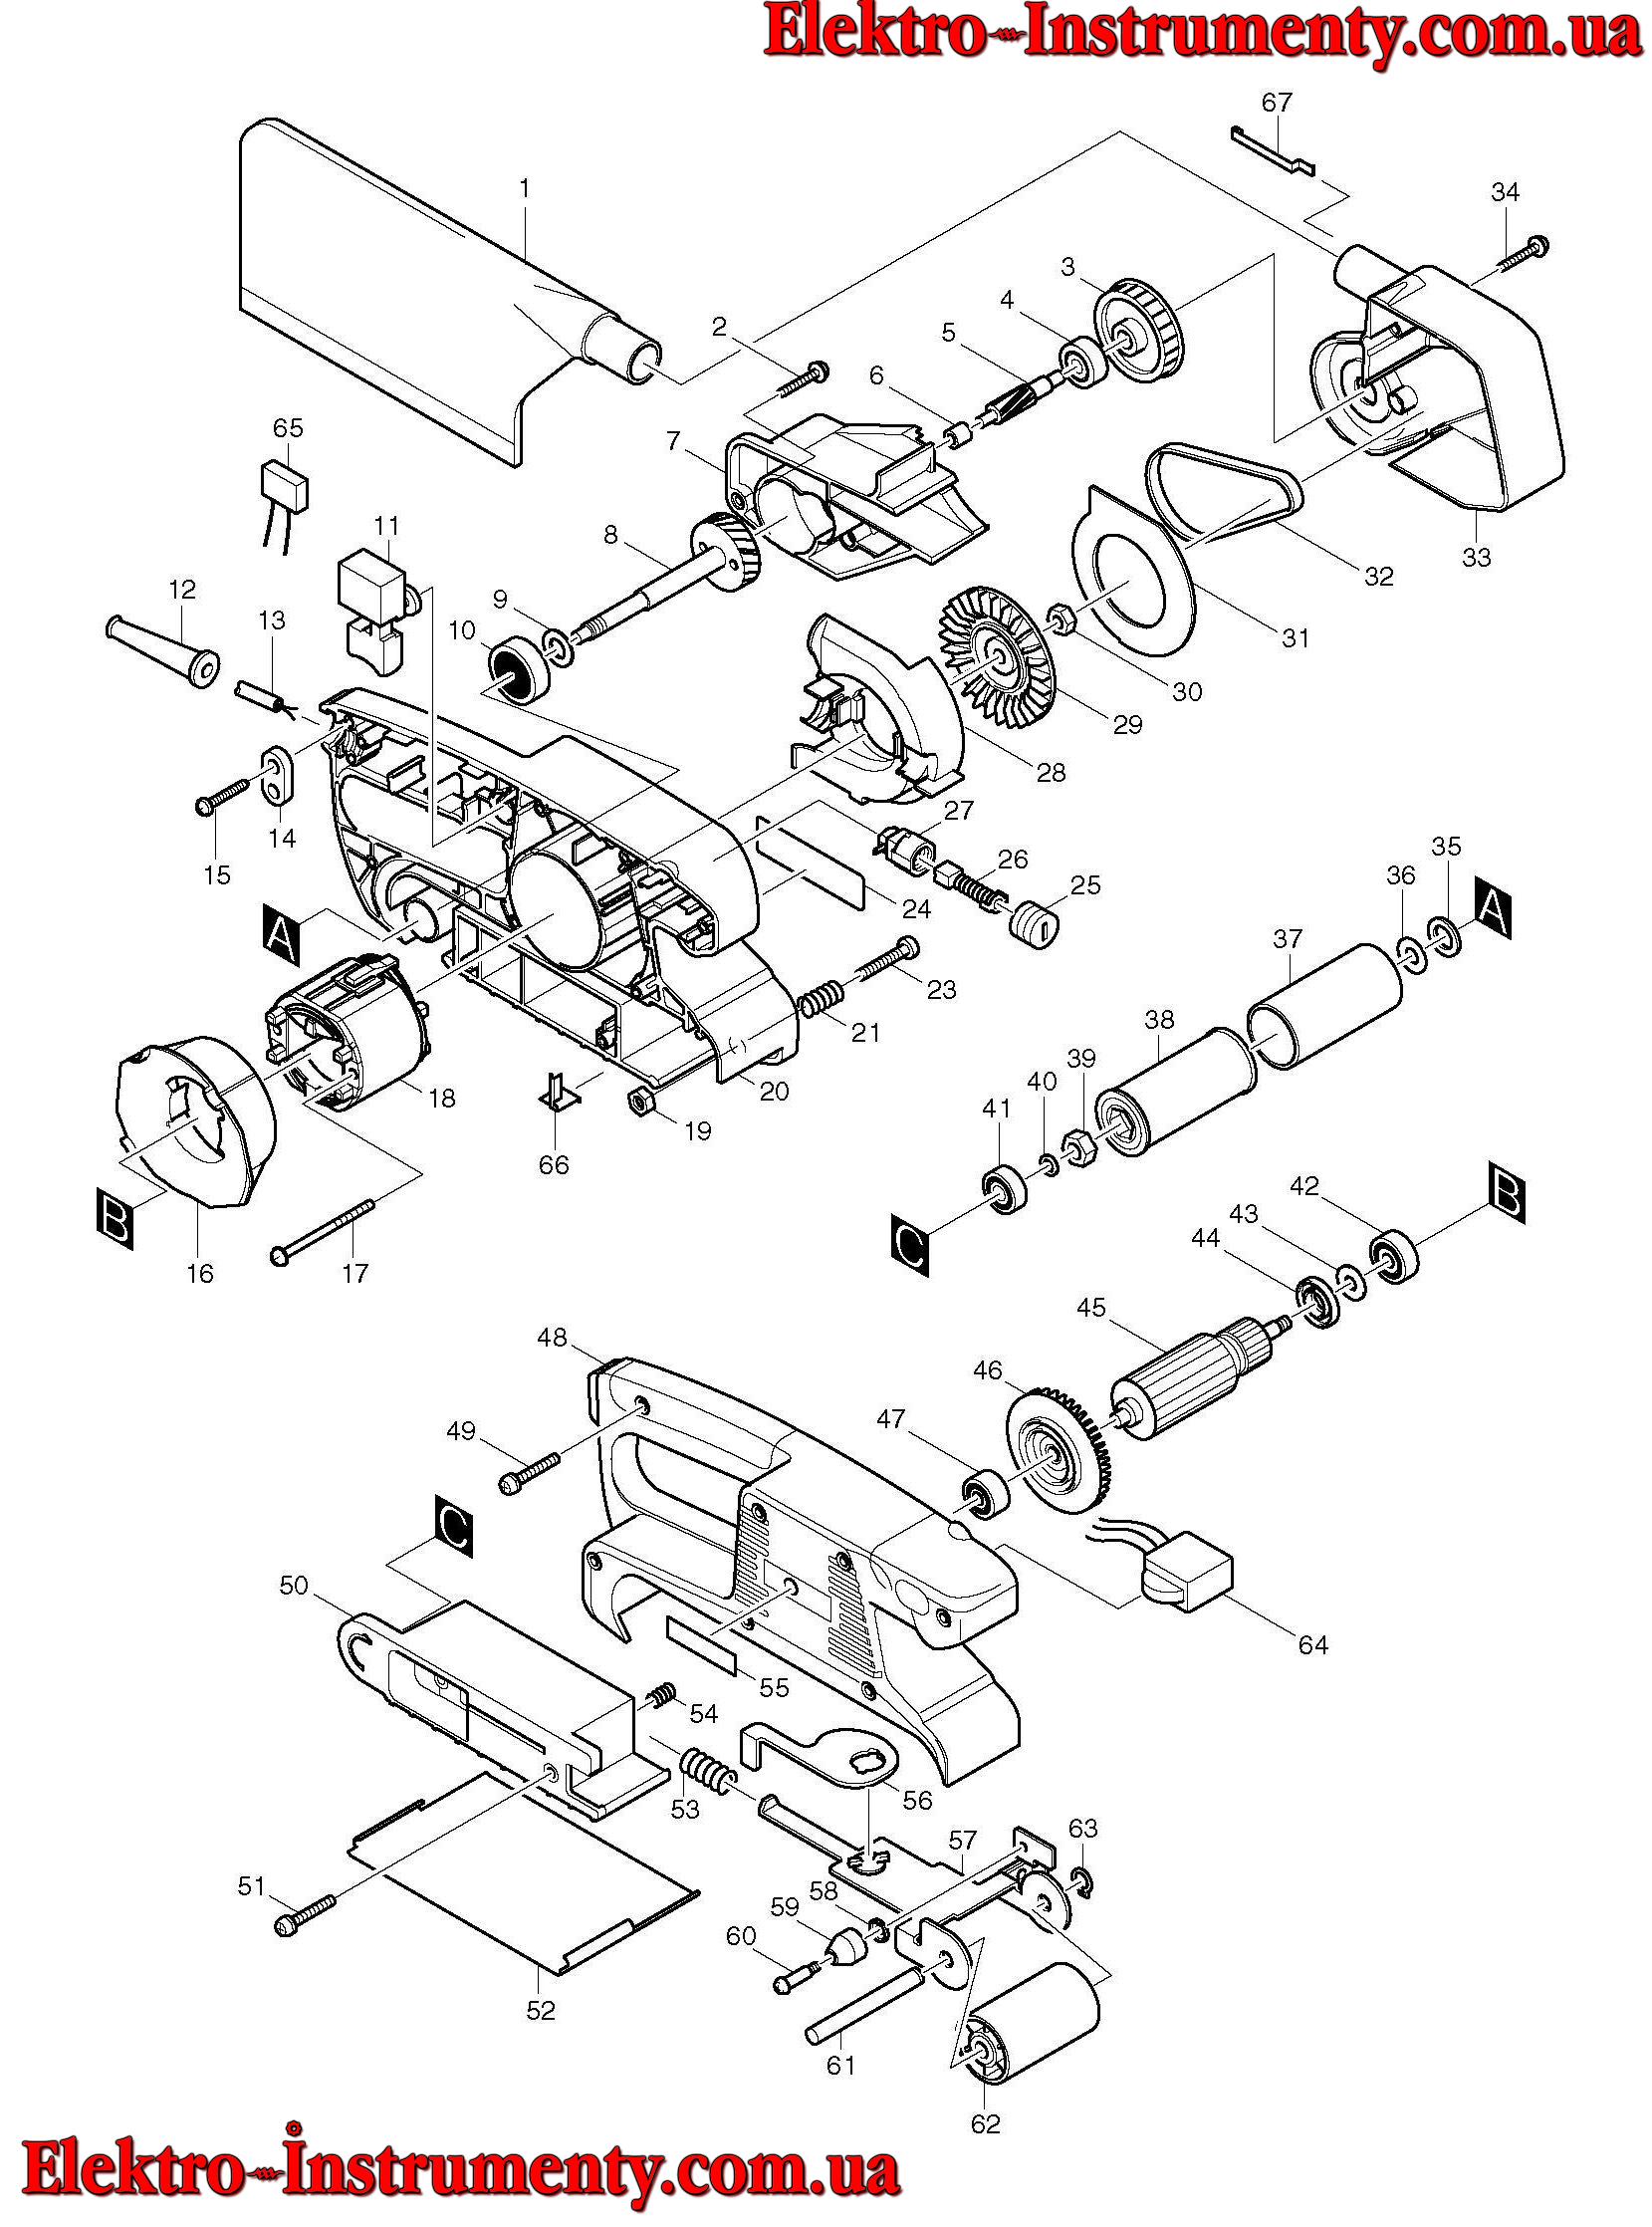 Шлифмашинка макита 9911 ремонт своими руками 50